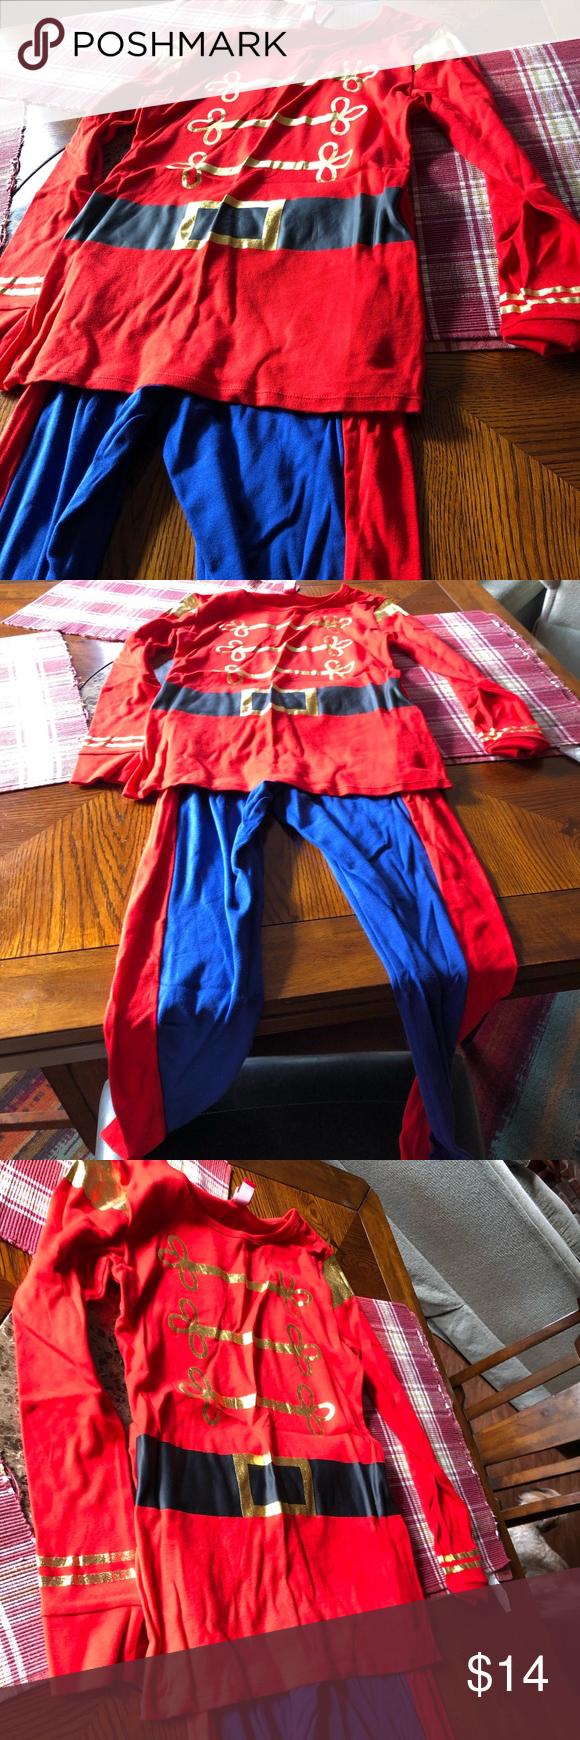 Toy soldier / nutcracker costume or Pajamas Nutcracker